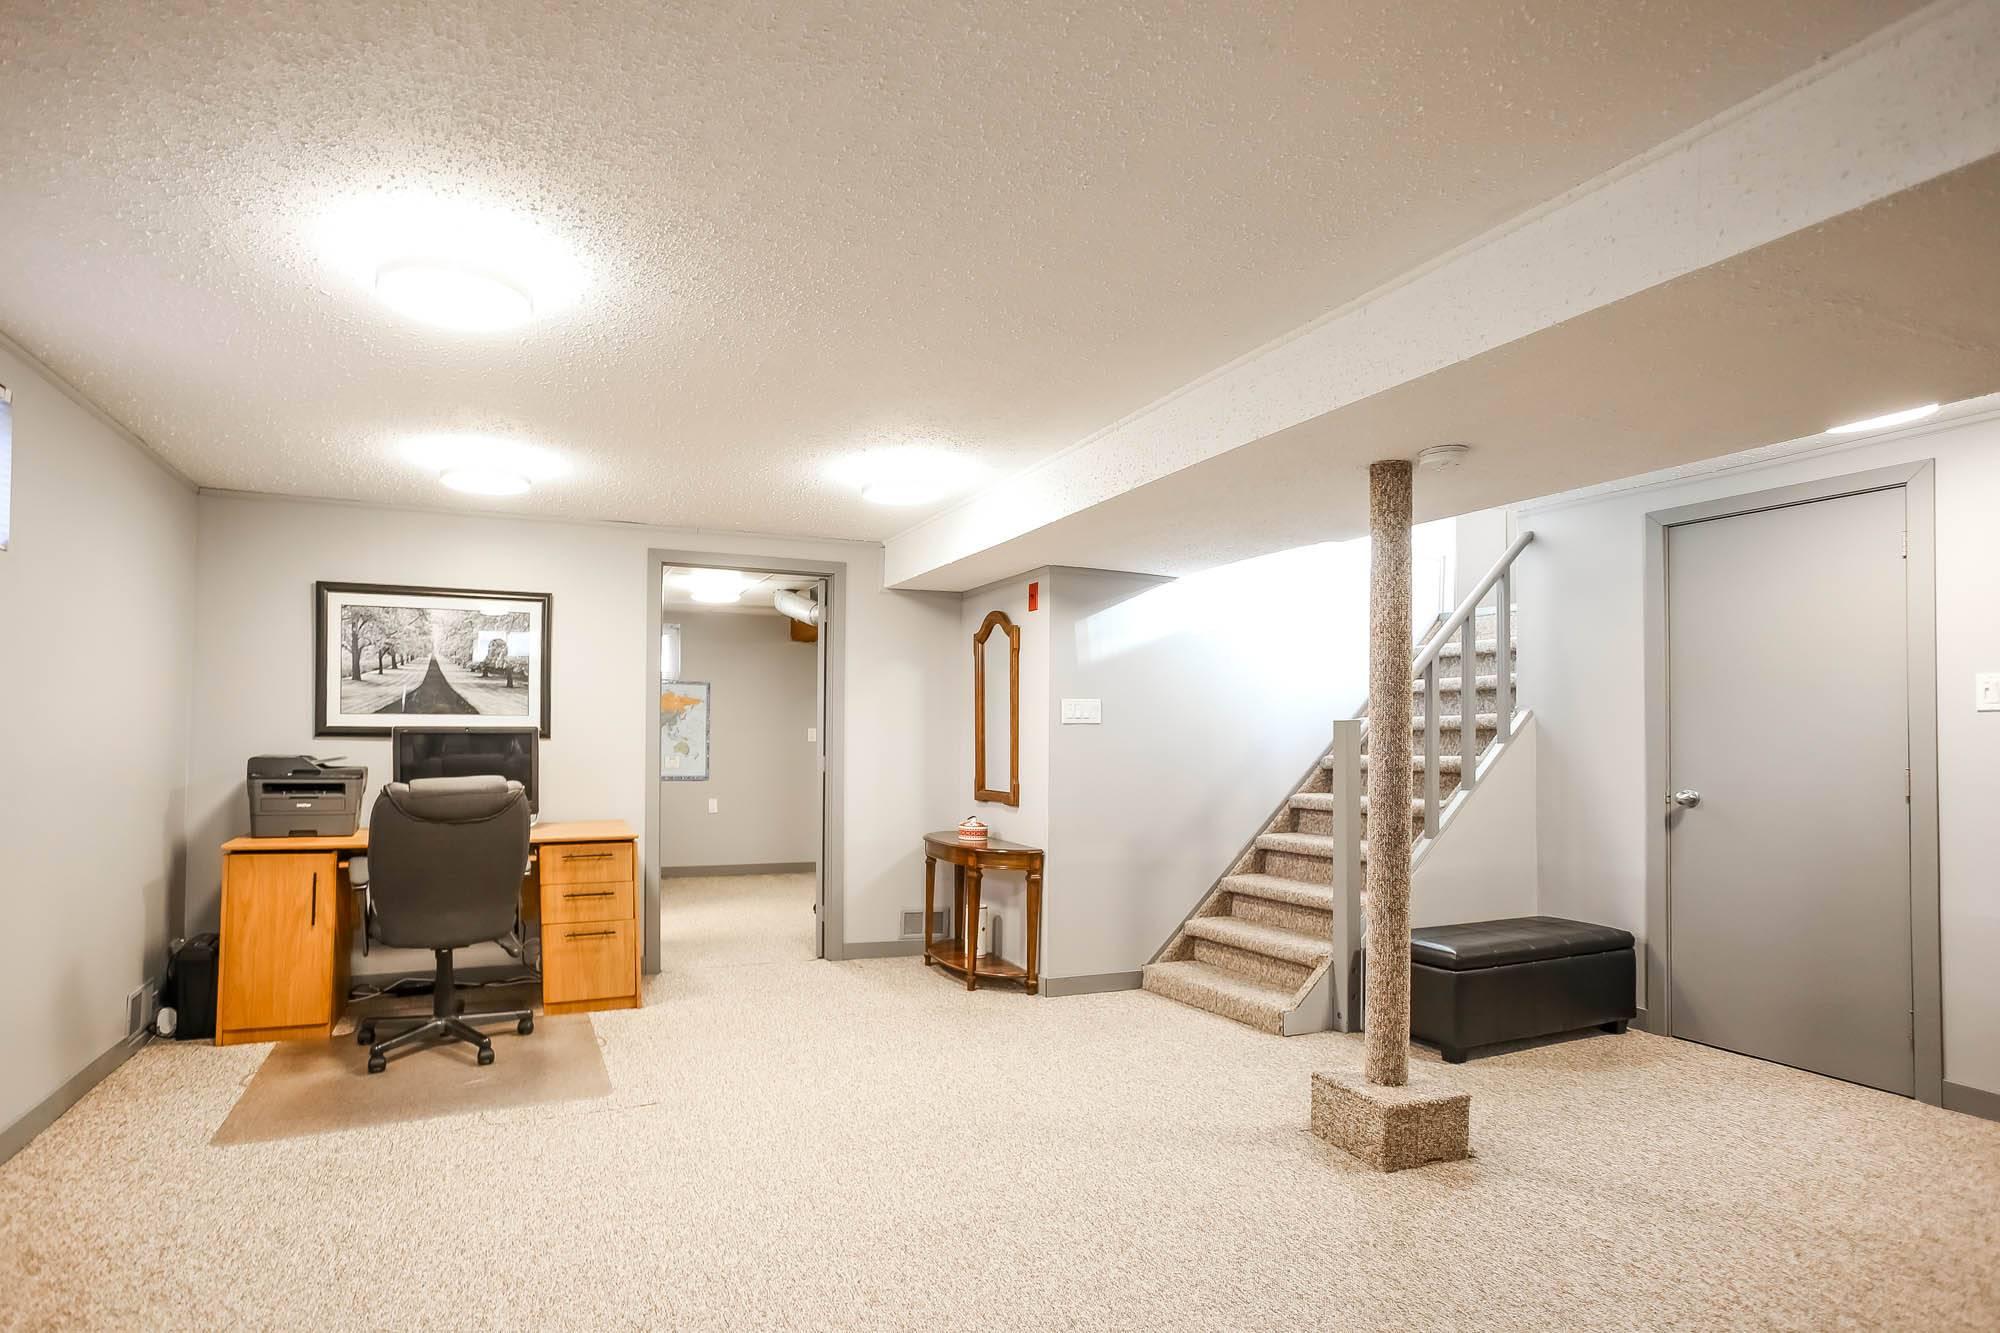 131 Crestwood, Winnipeg, Manitoba  R2J 1H8 - Photo 24 - 1929711